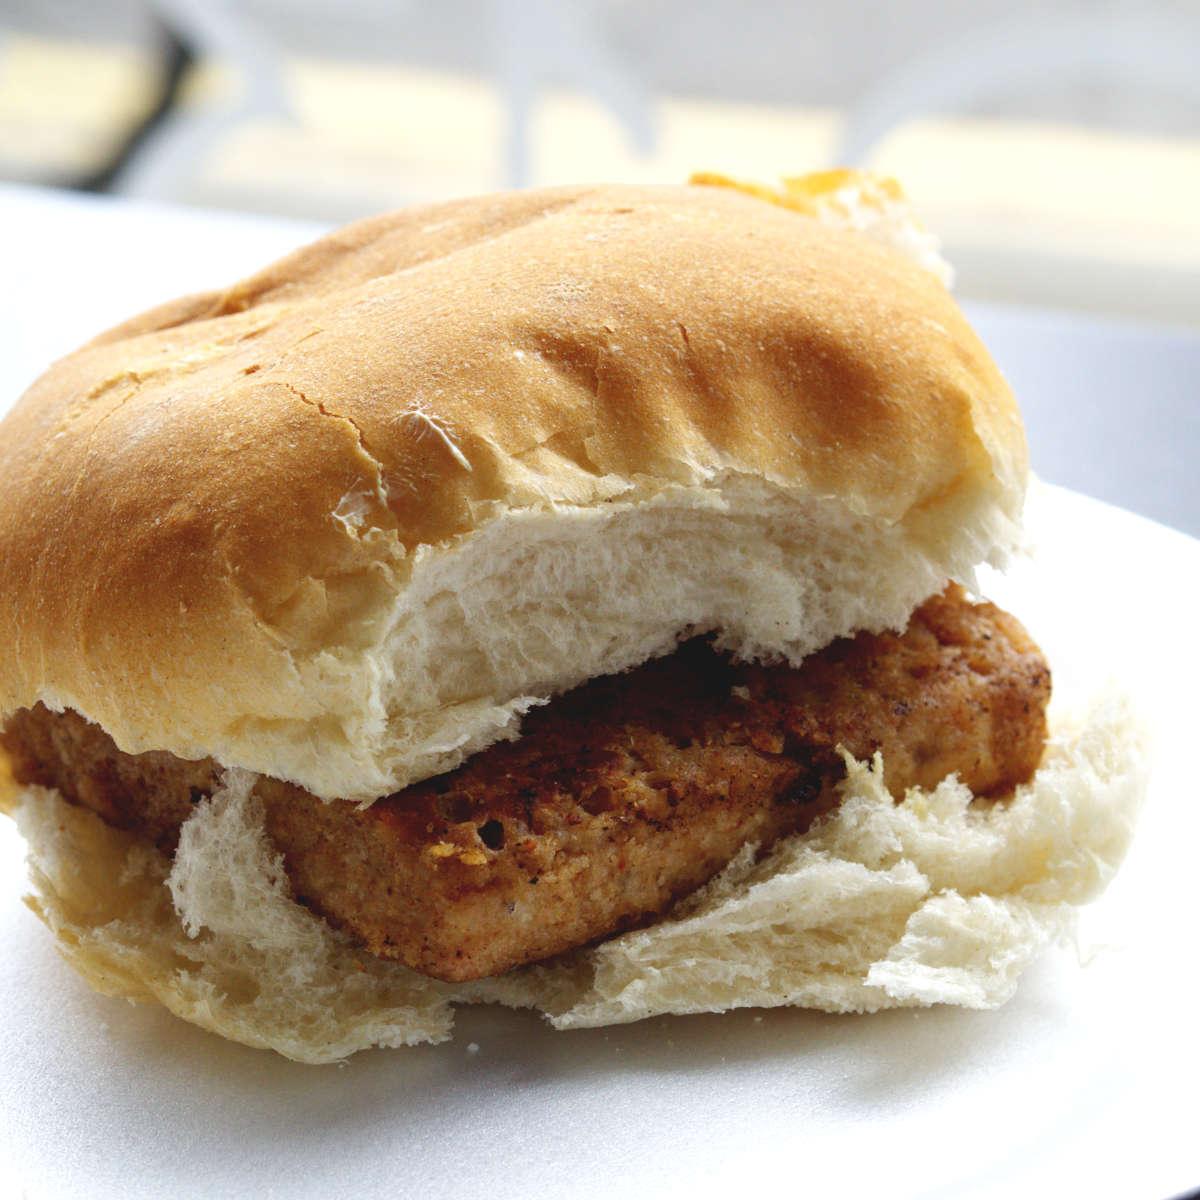 Vegan lorne sausage roll at BBL, Edinburgh